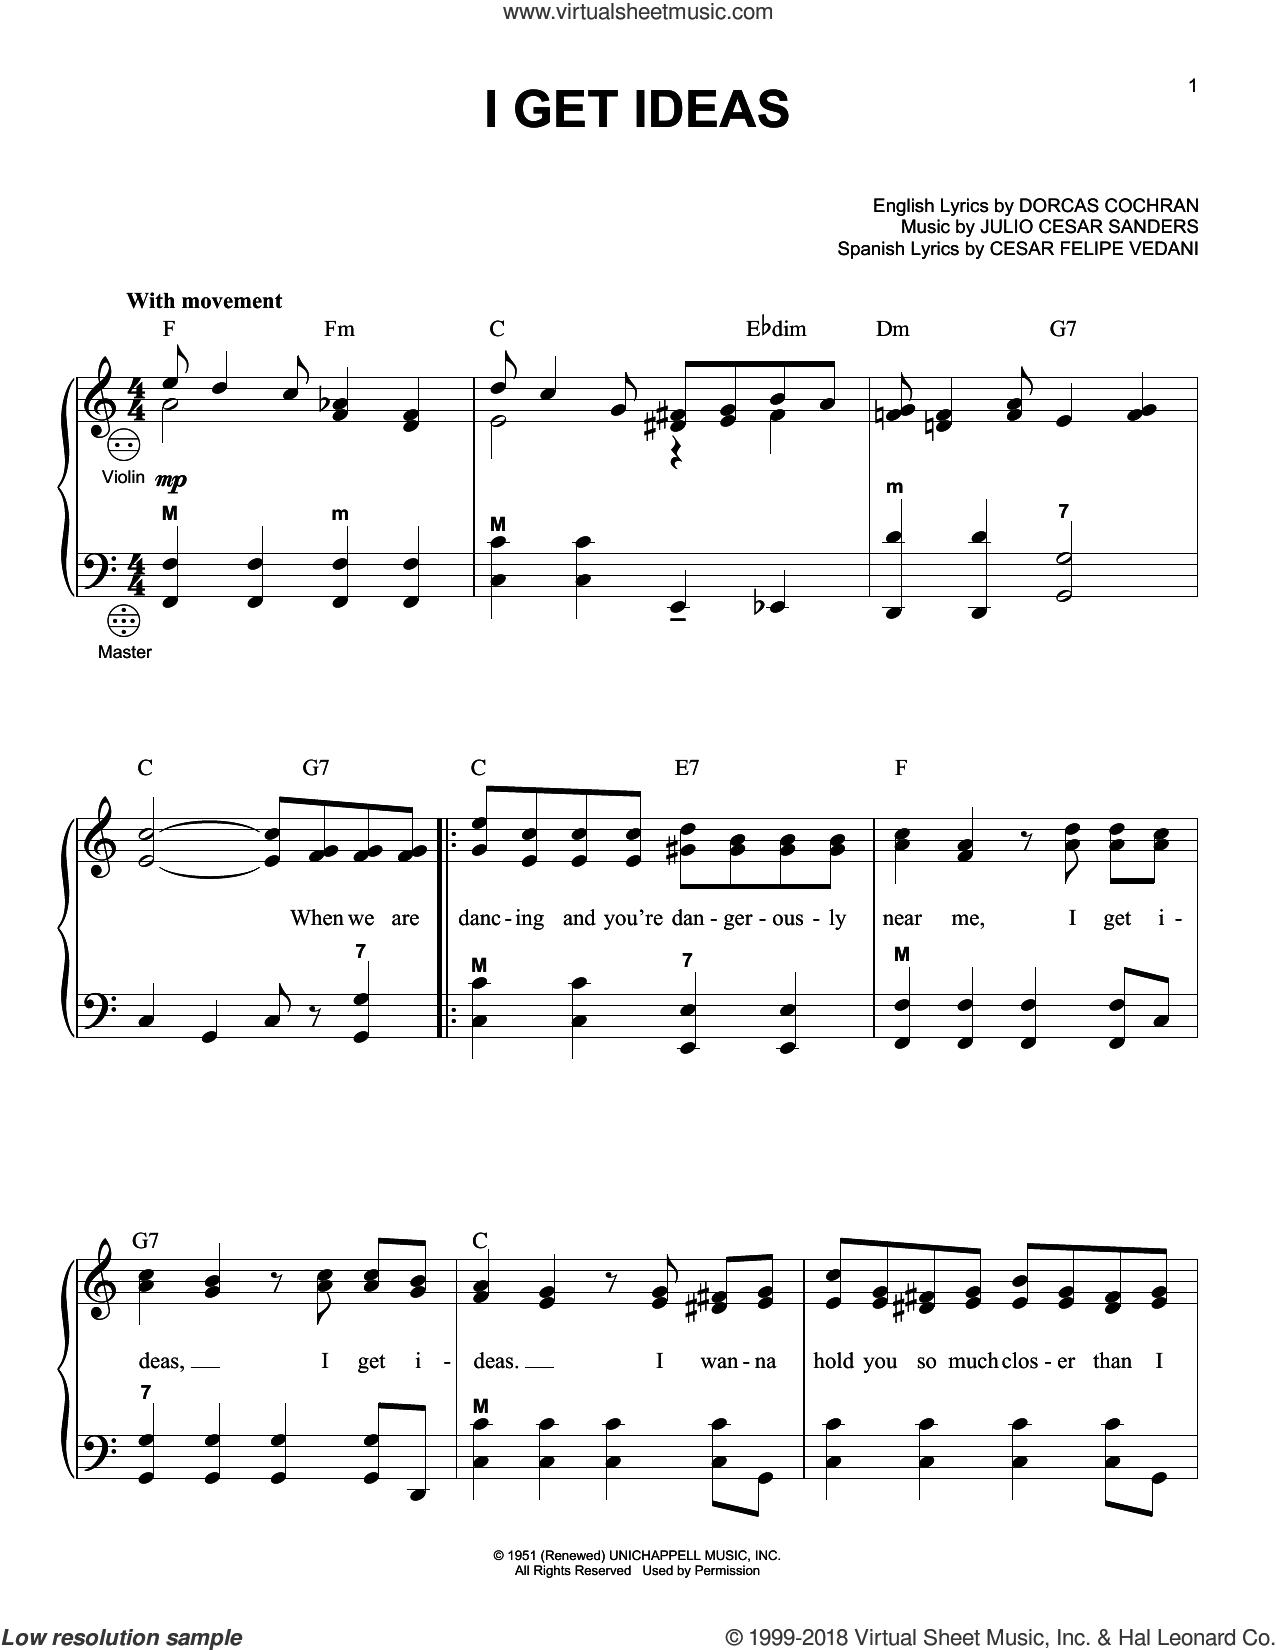 I Get Ideas sheet music for accordion by Julio Cesar Sanders, Gary Meisner, Cesar Felipe Vedani and Dorcas Cochran, intermediate skill level